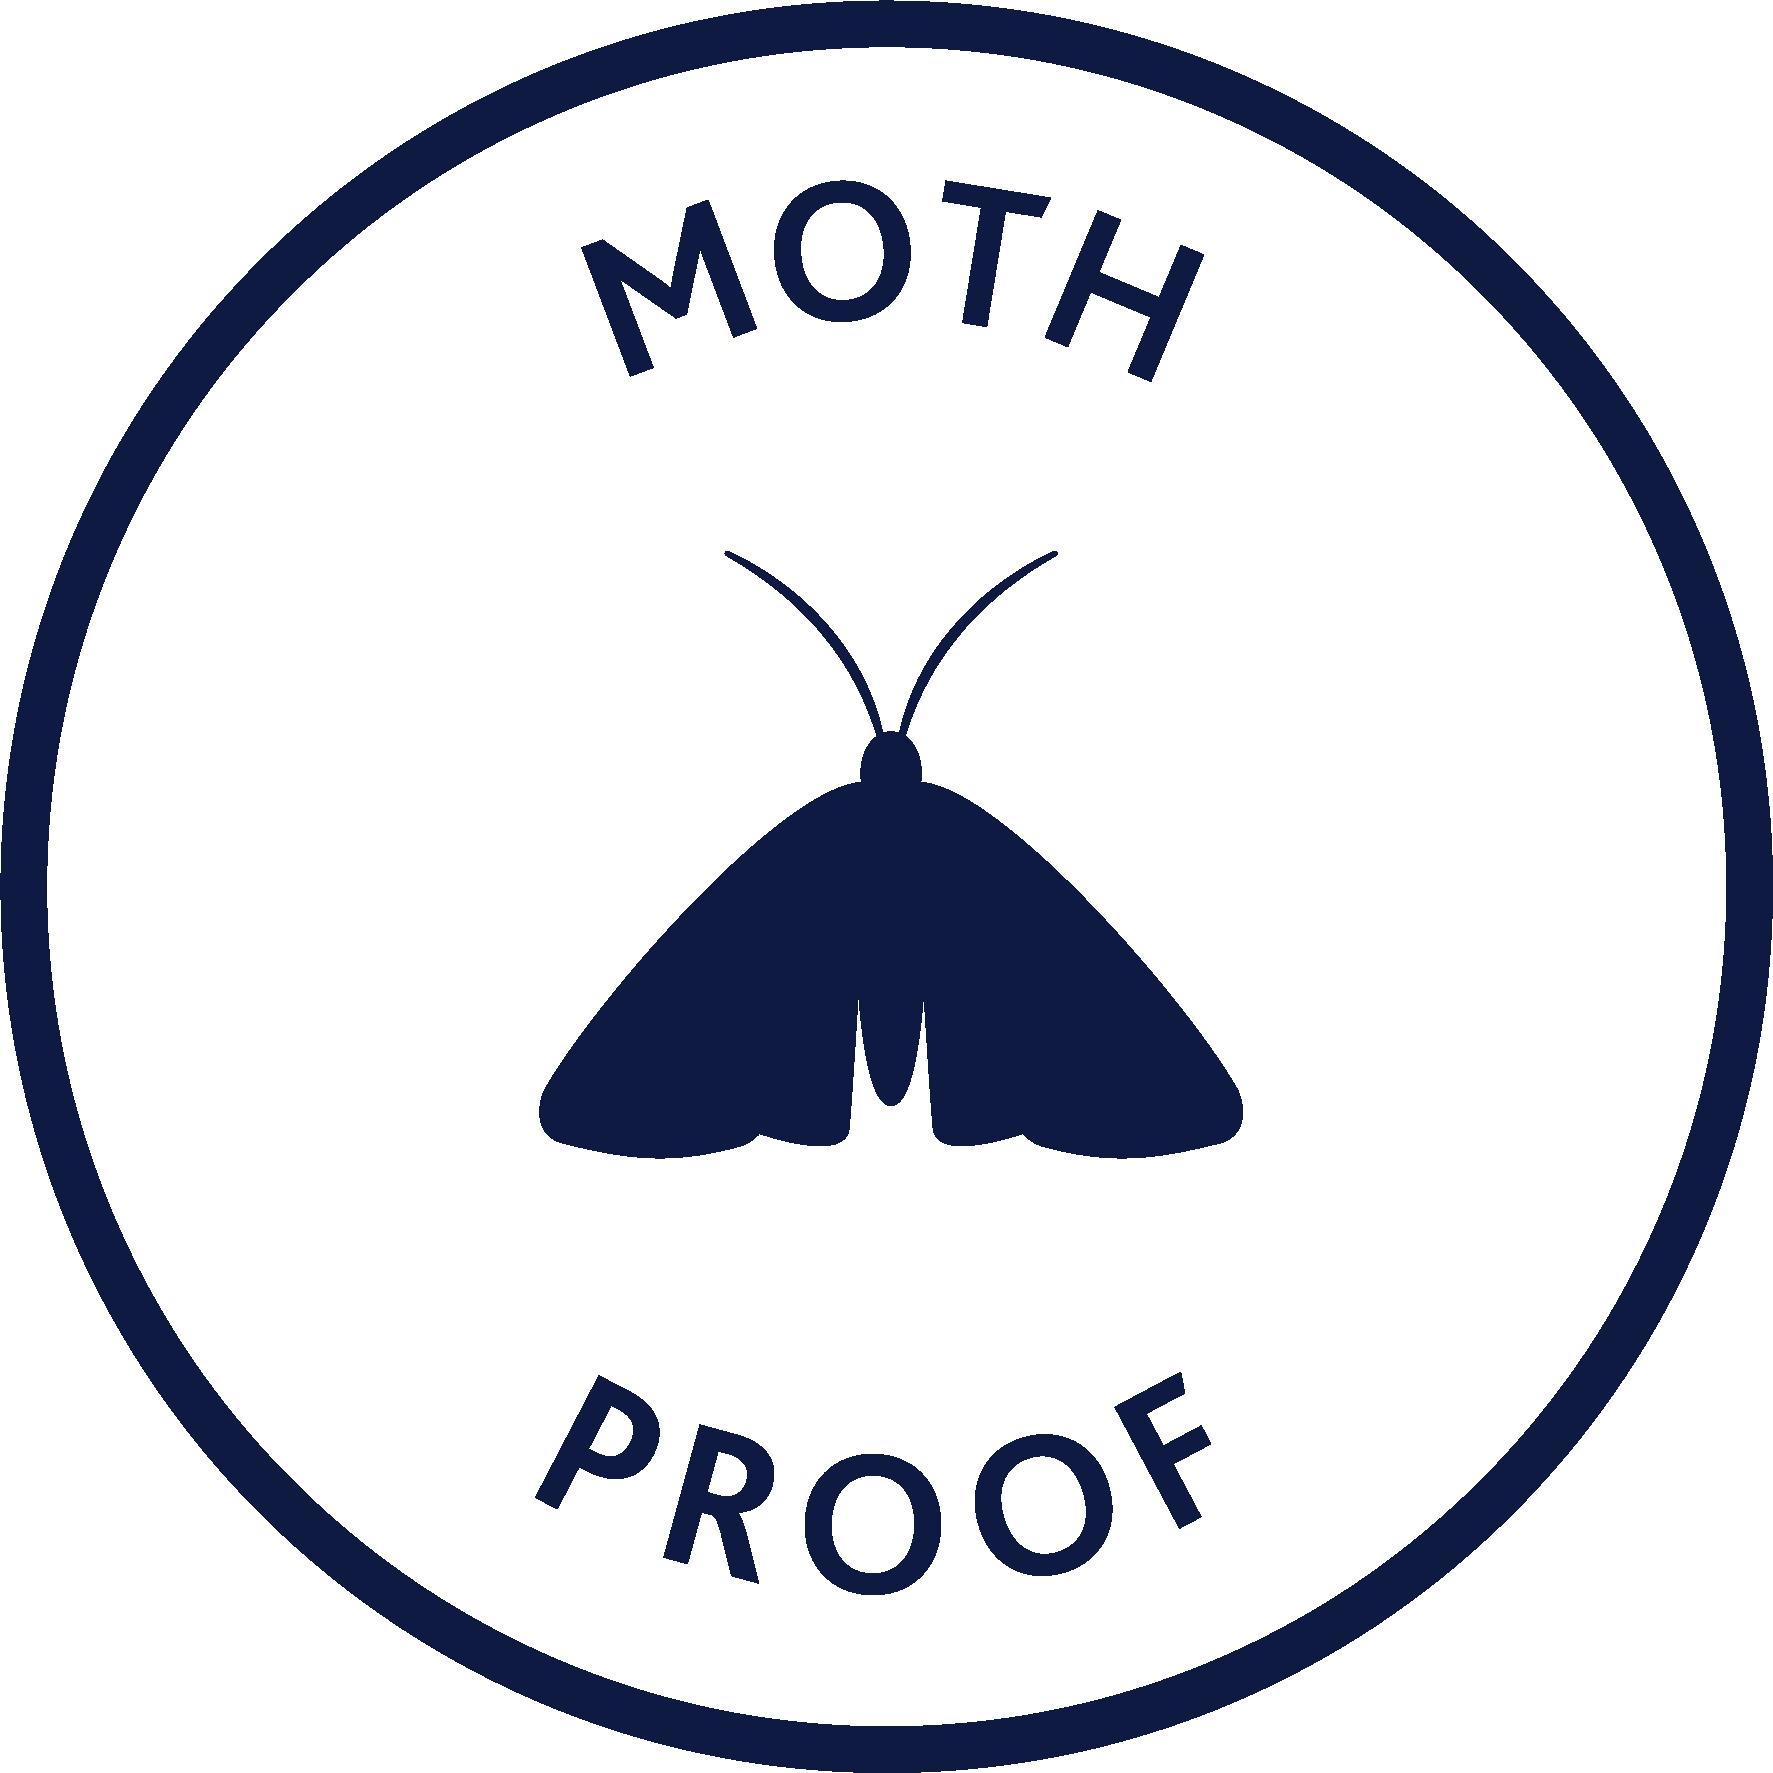 luxuria-moth-proof